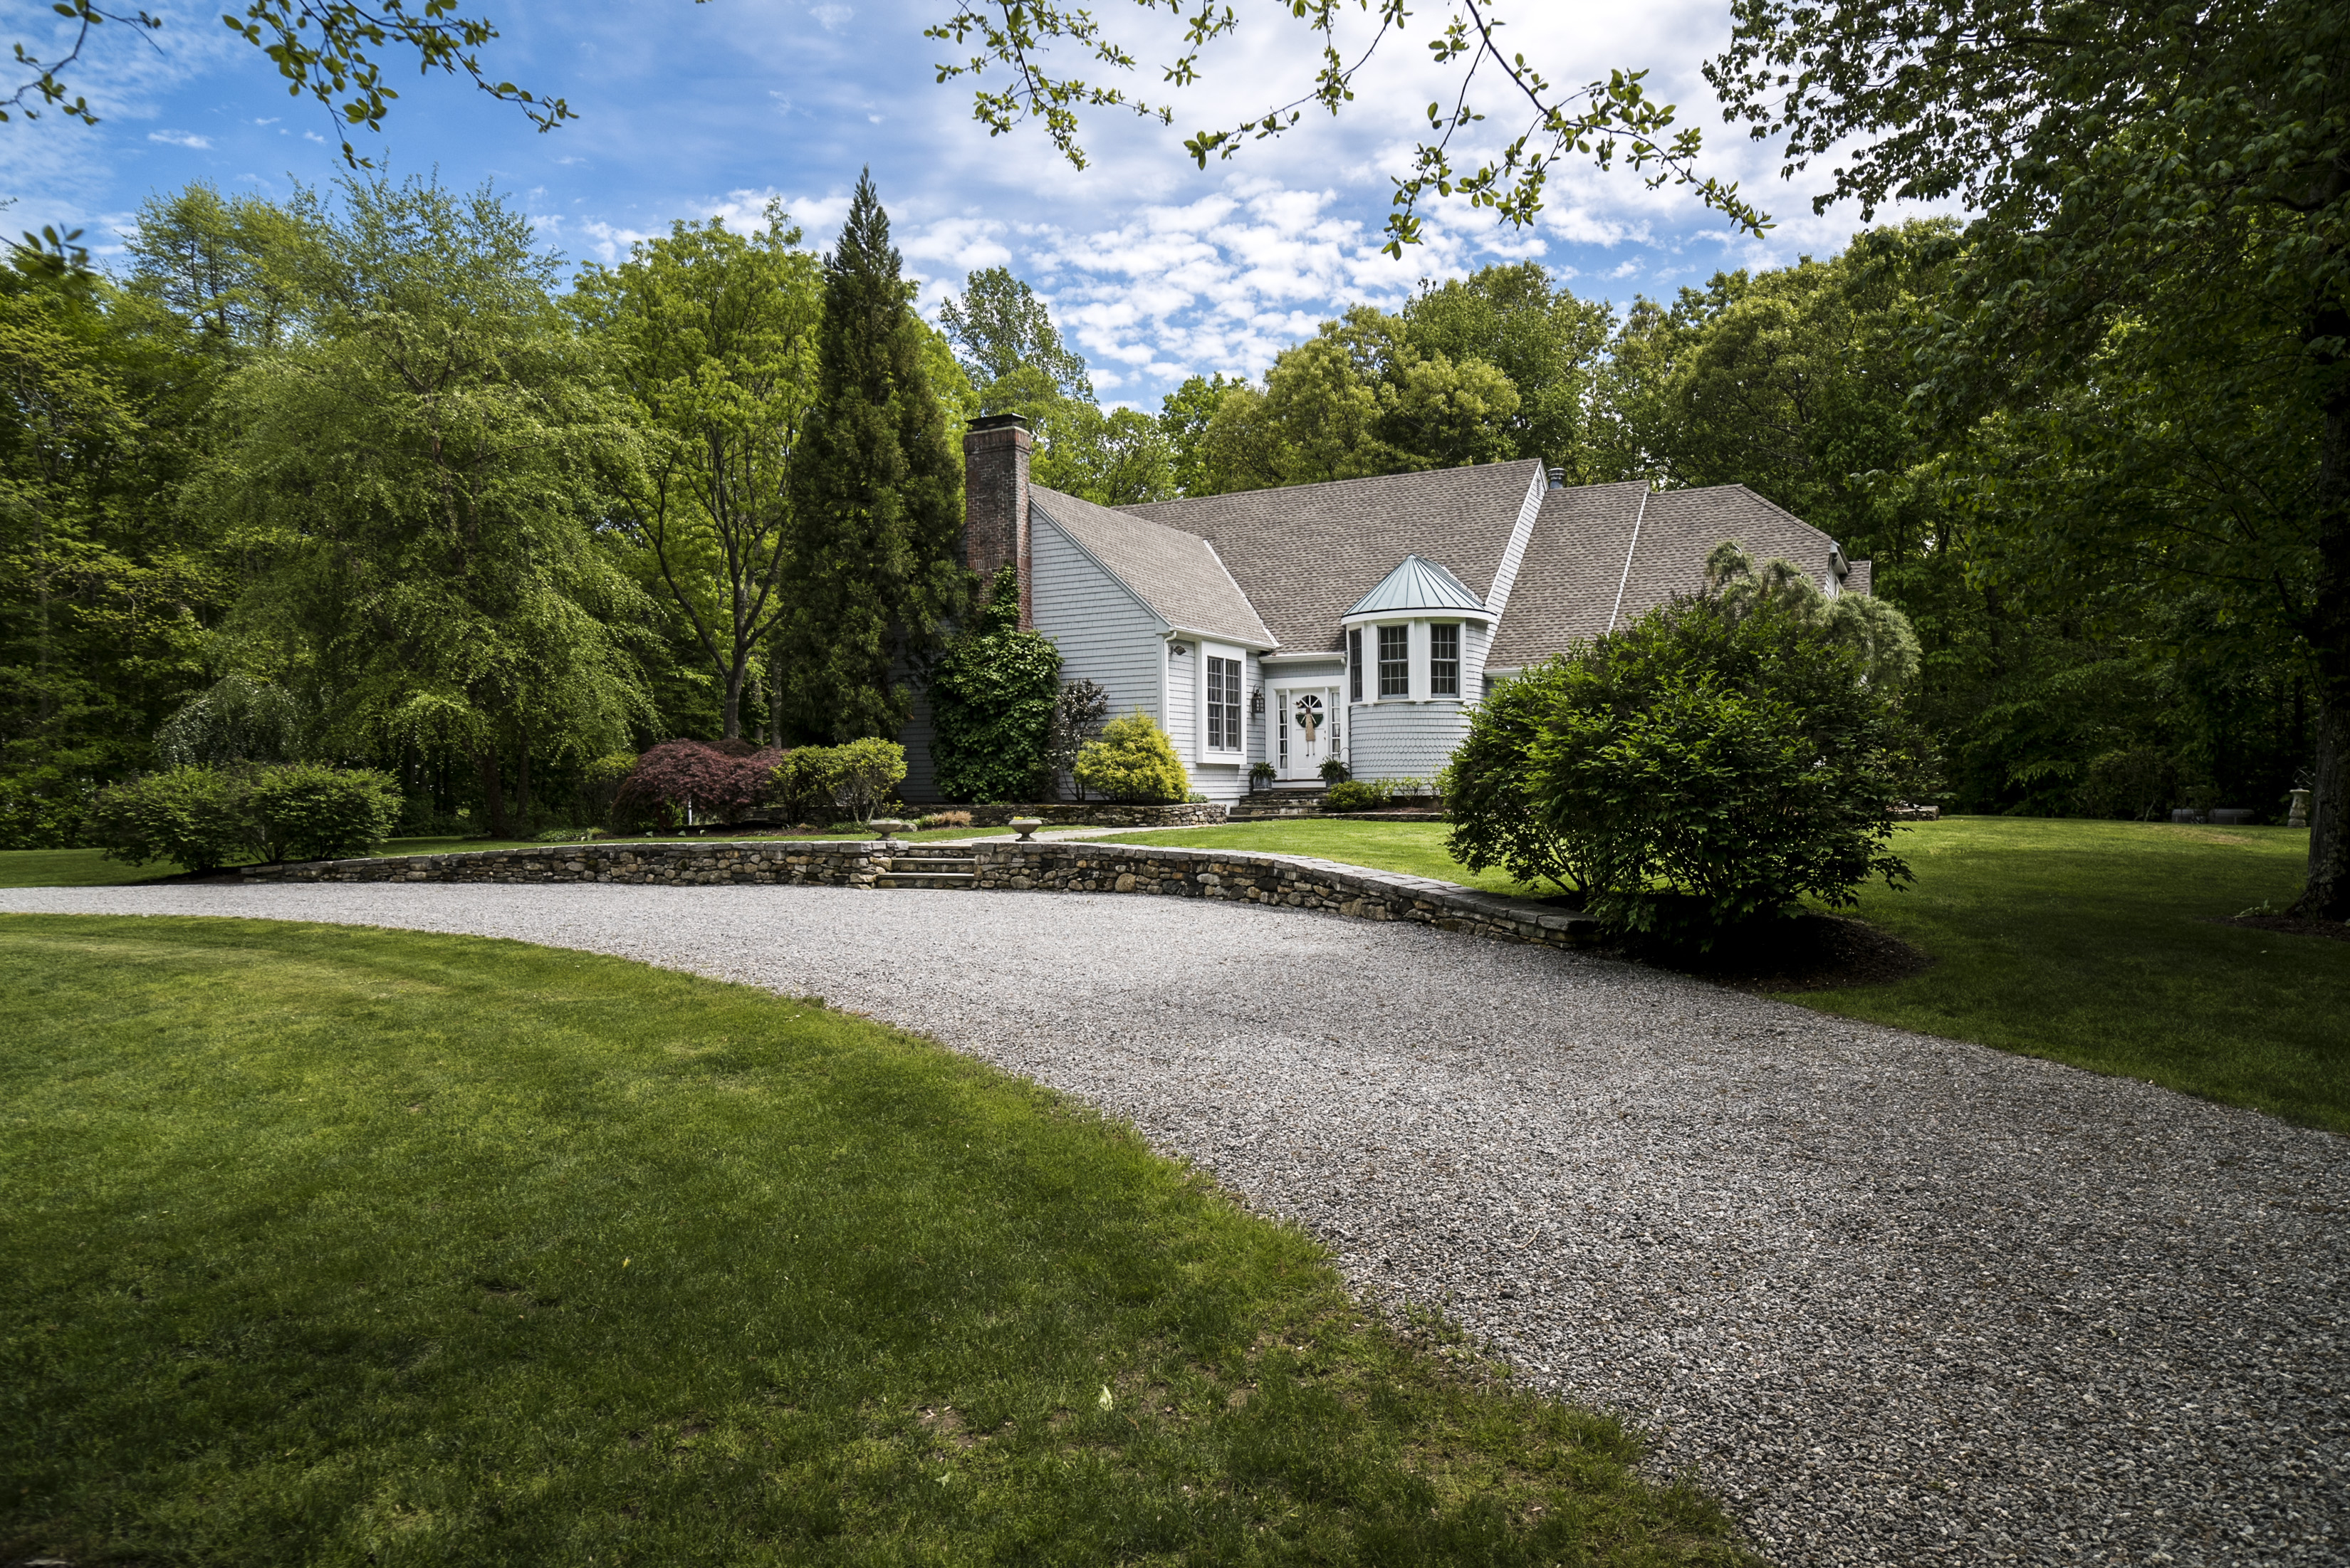 Moradia para Venda às 23 Welsch Farms Road Killingworth, Connecticut 06419 Estados Unidos